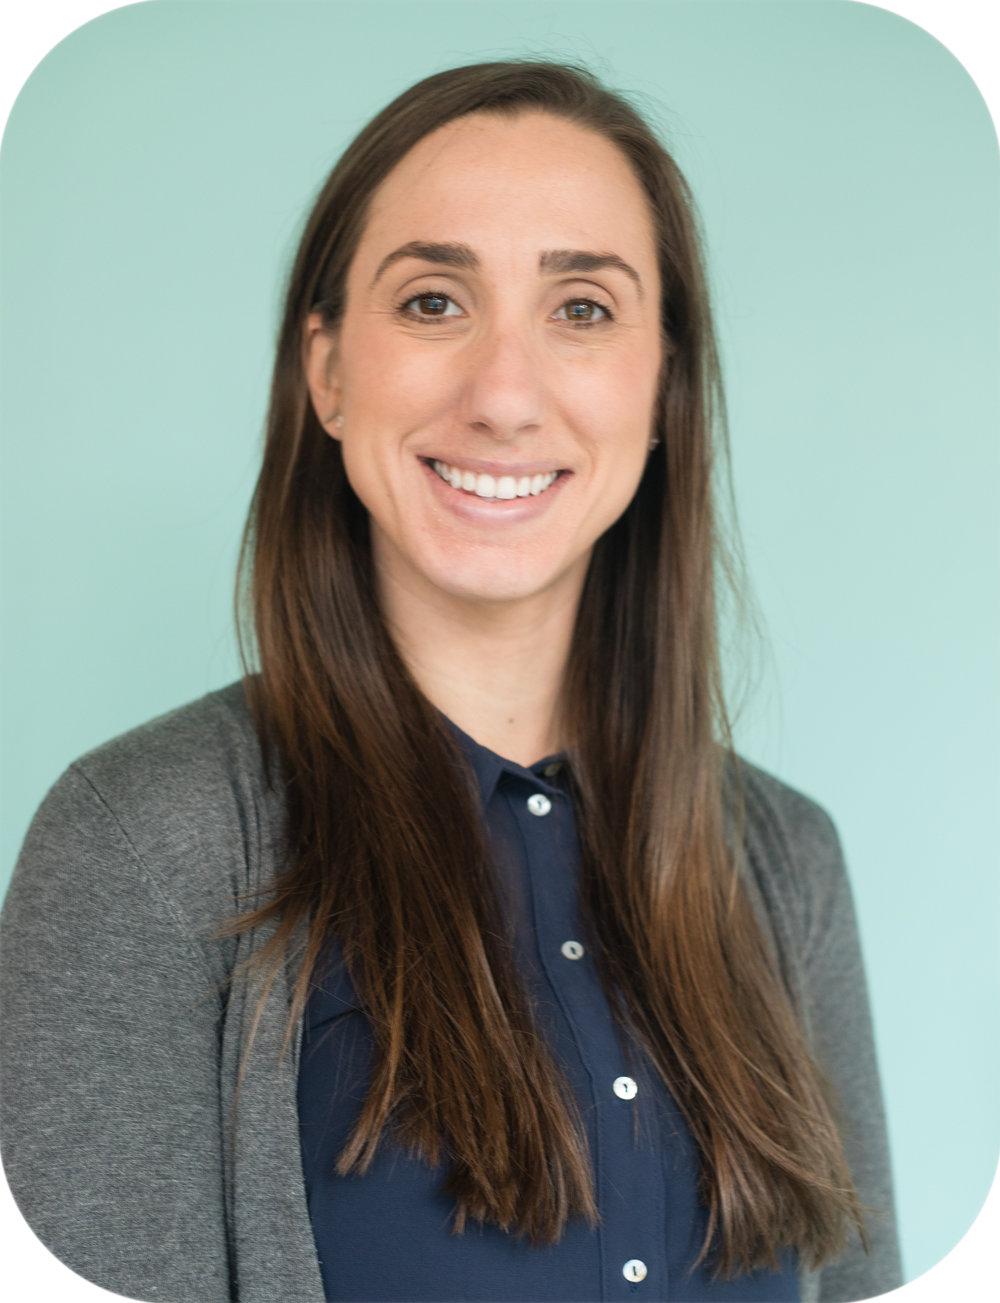 Alyssa Glasser, Billing & Claims Specialist